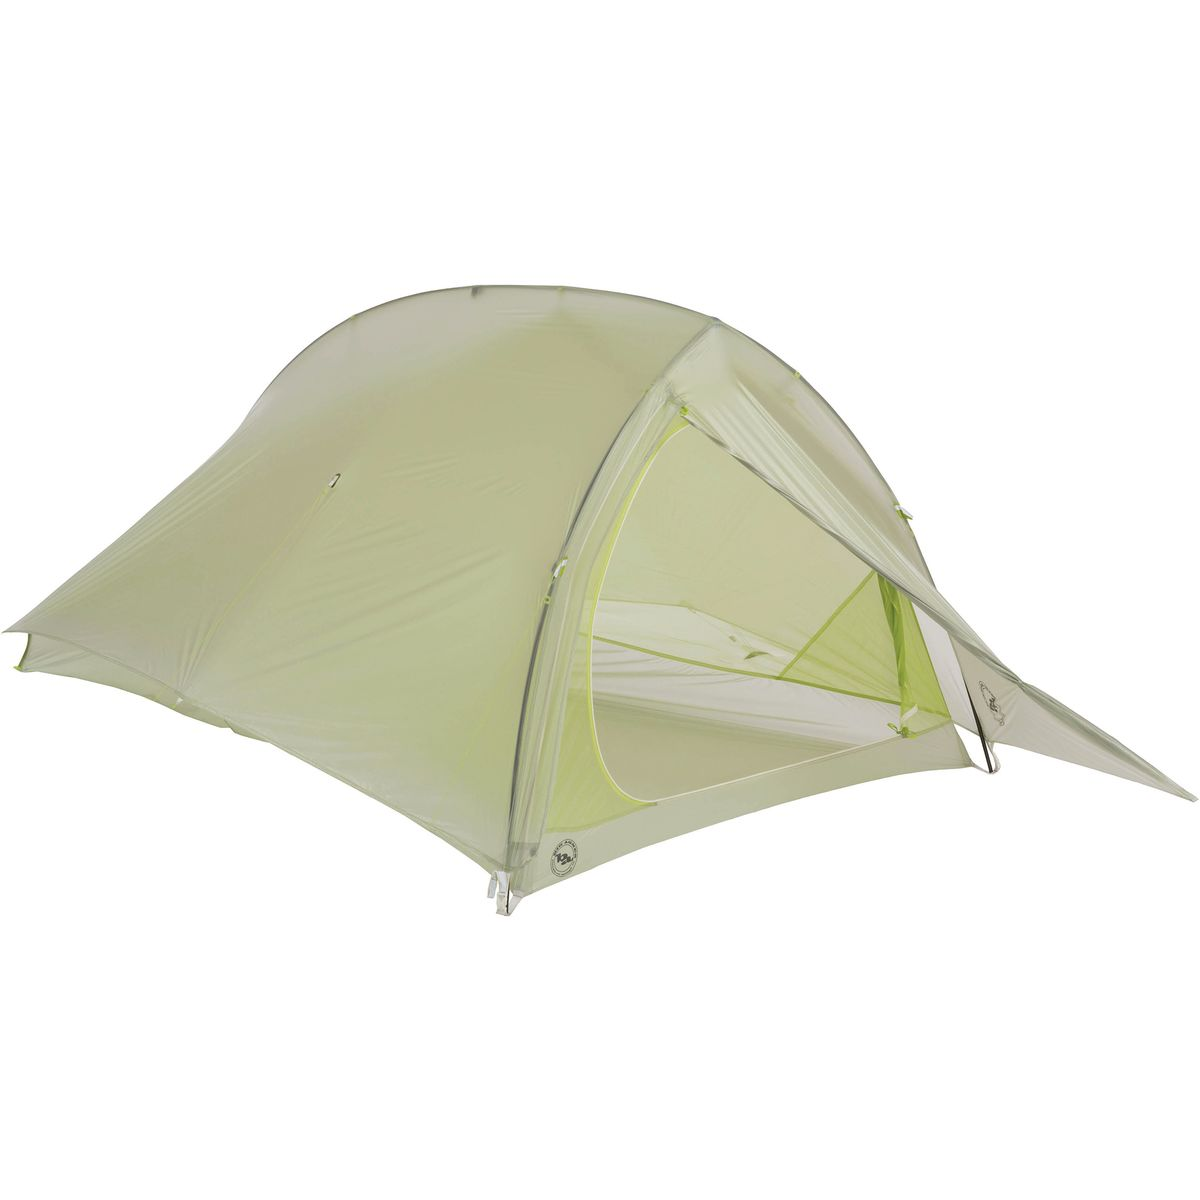 Big Agnes Fly Creek 2 Platinum HV Tent: 2-Person 3-Season Gray/Green, One Size